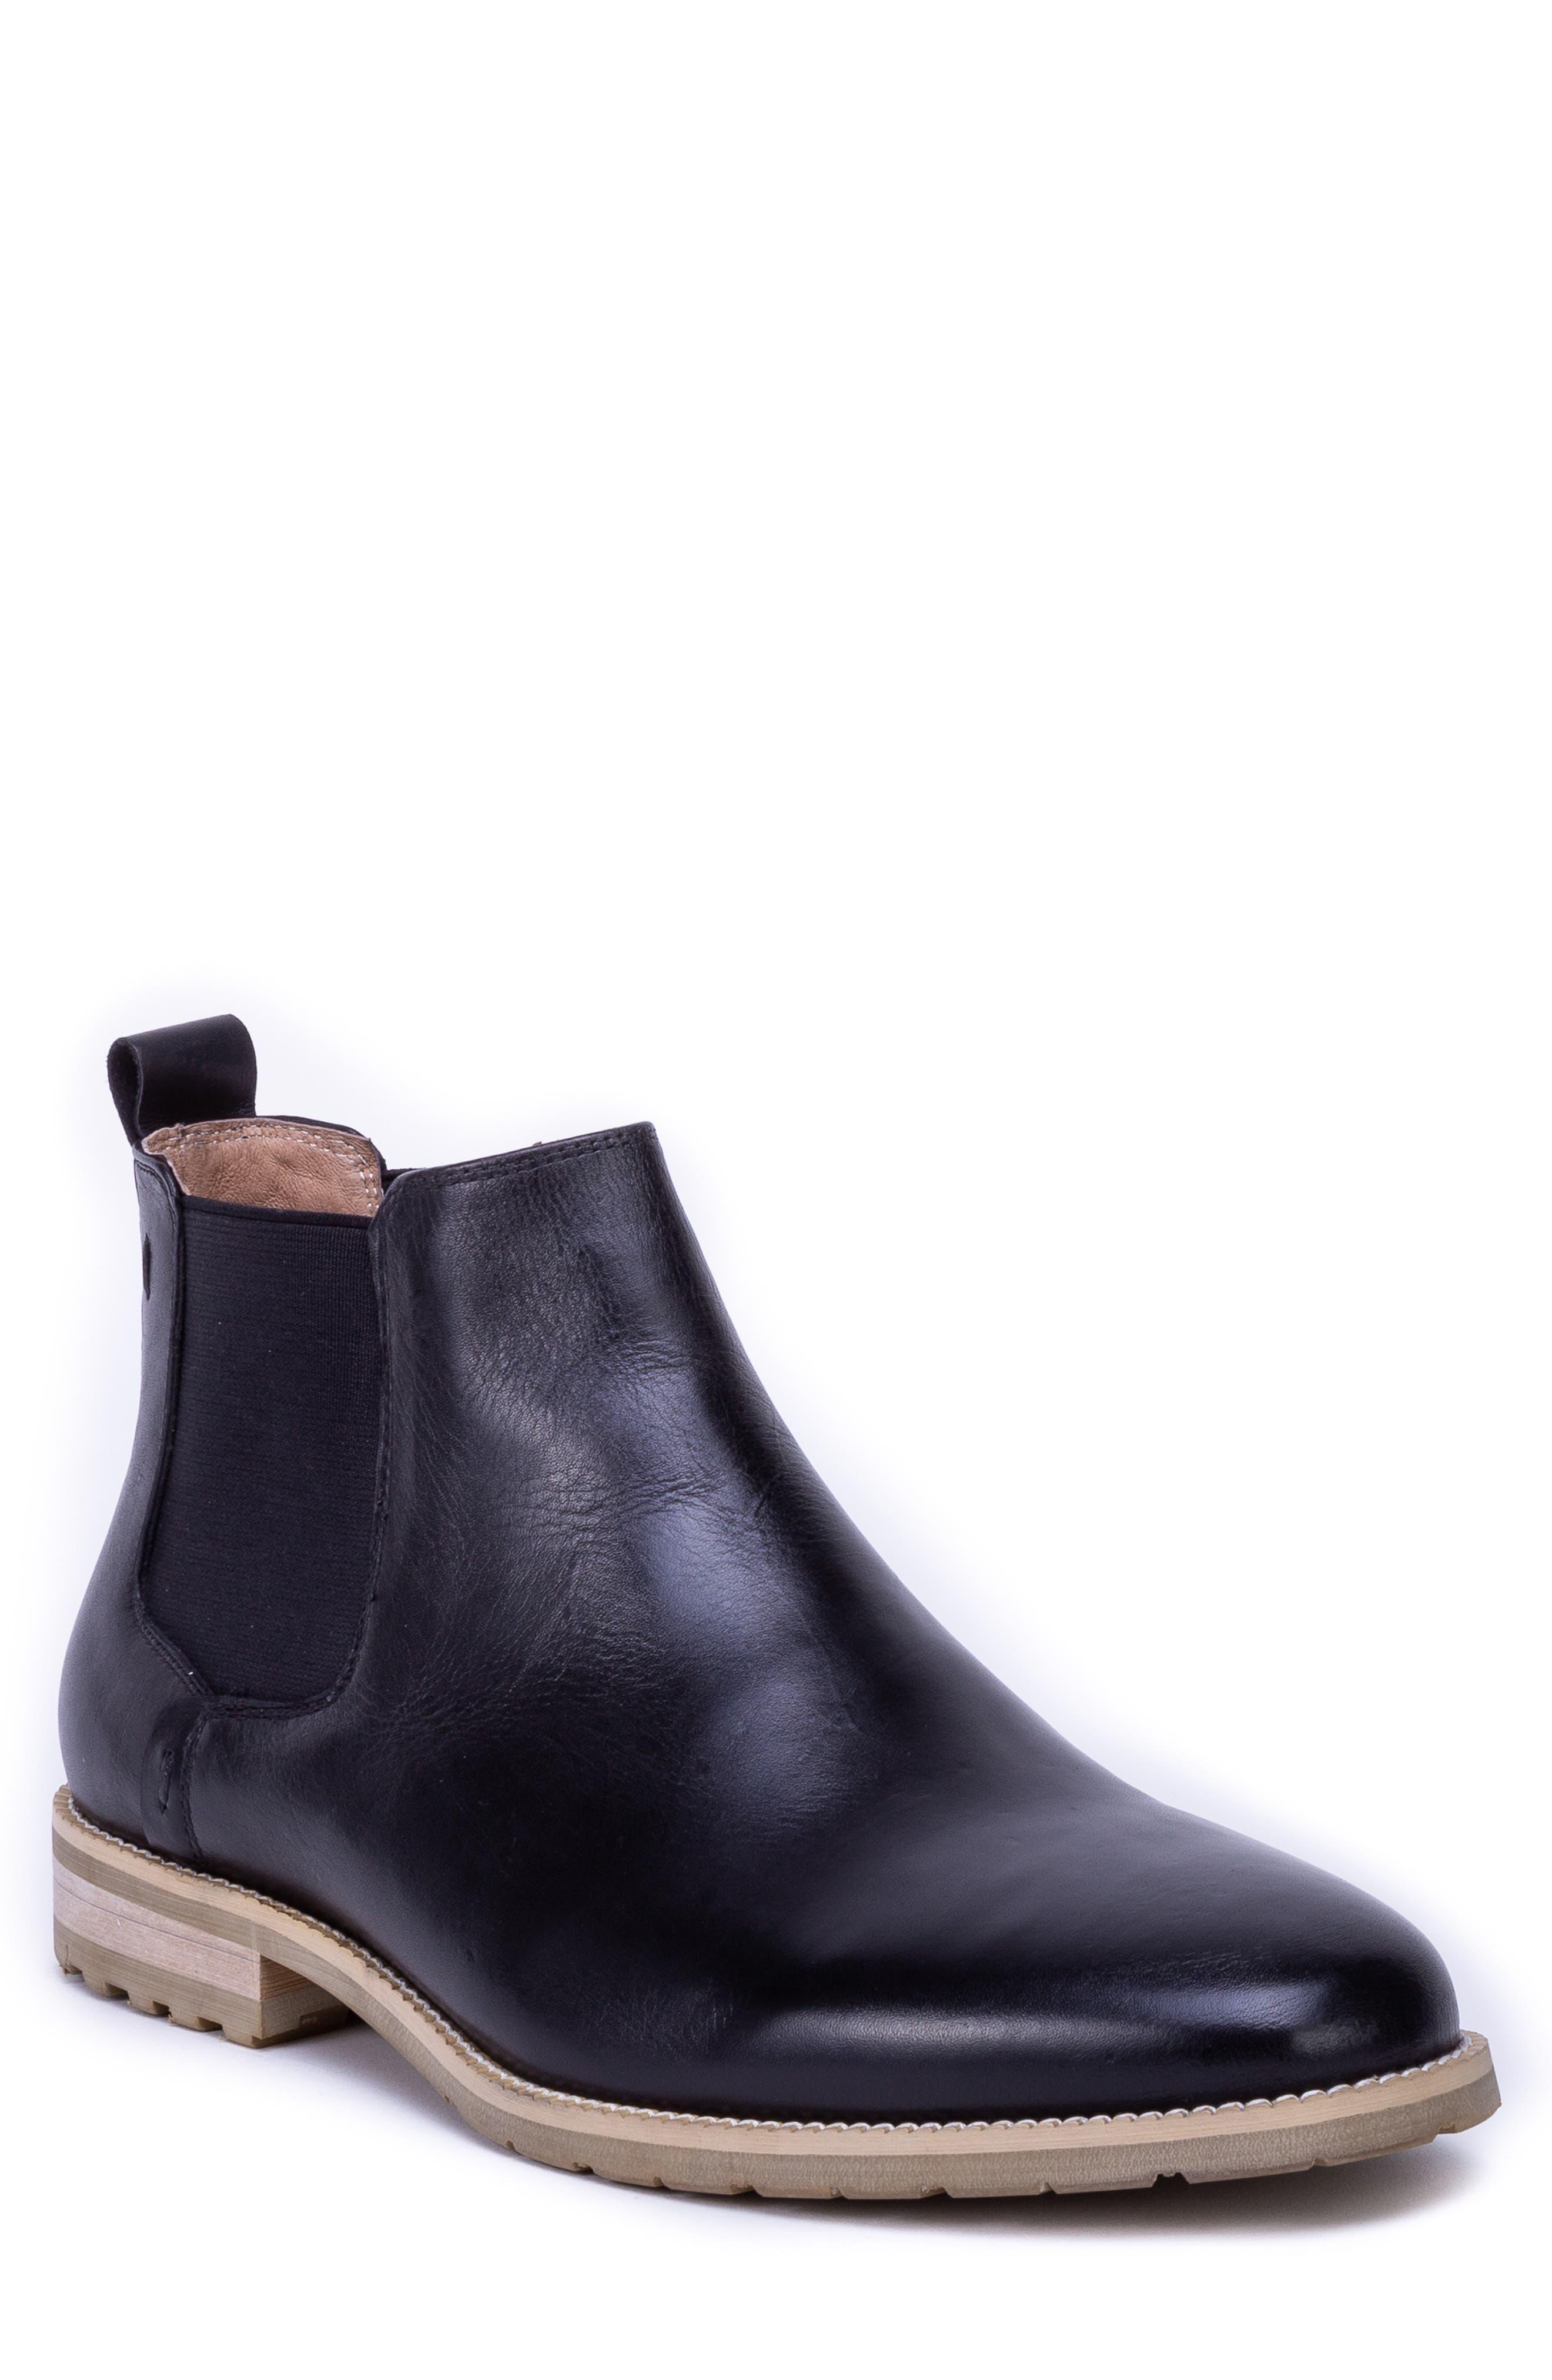 Zanzara Woody Chelsea Boot- Black